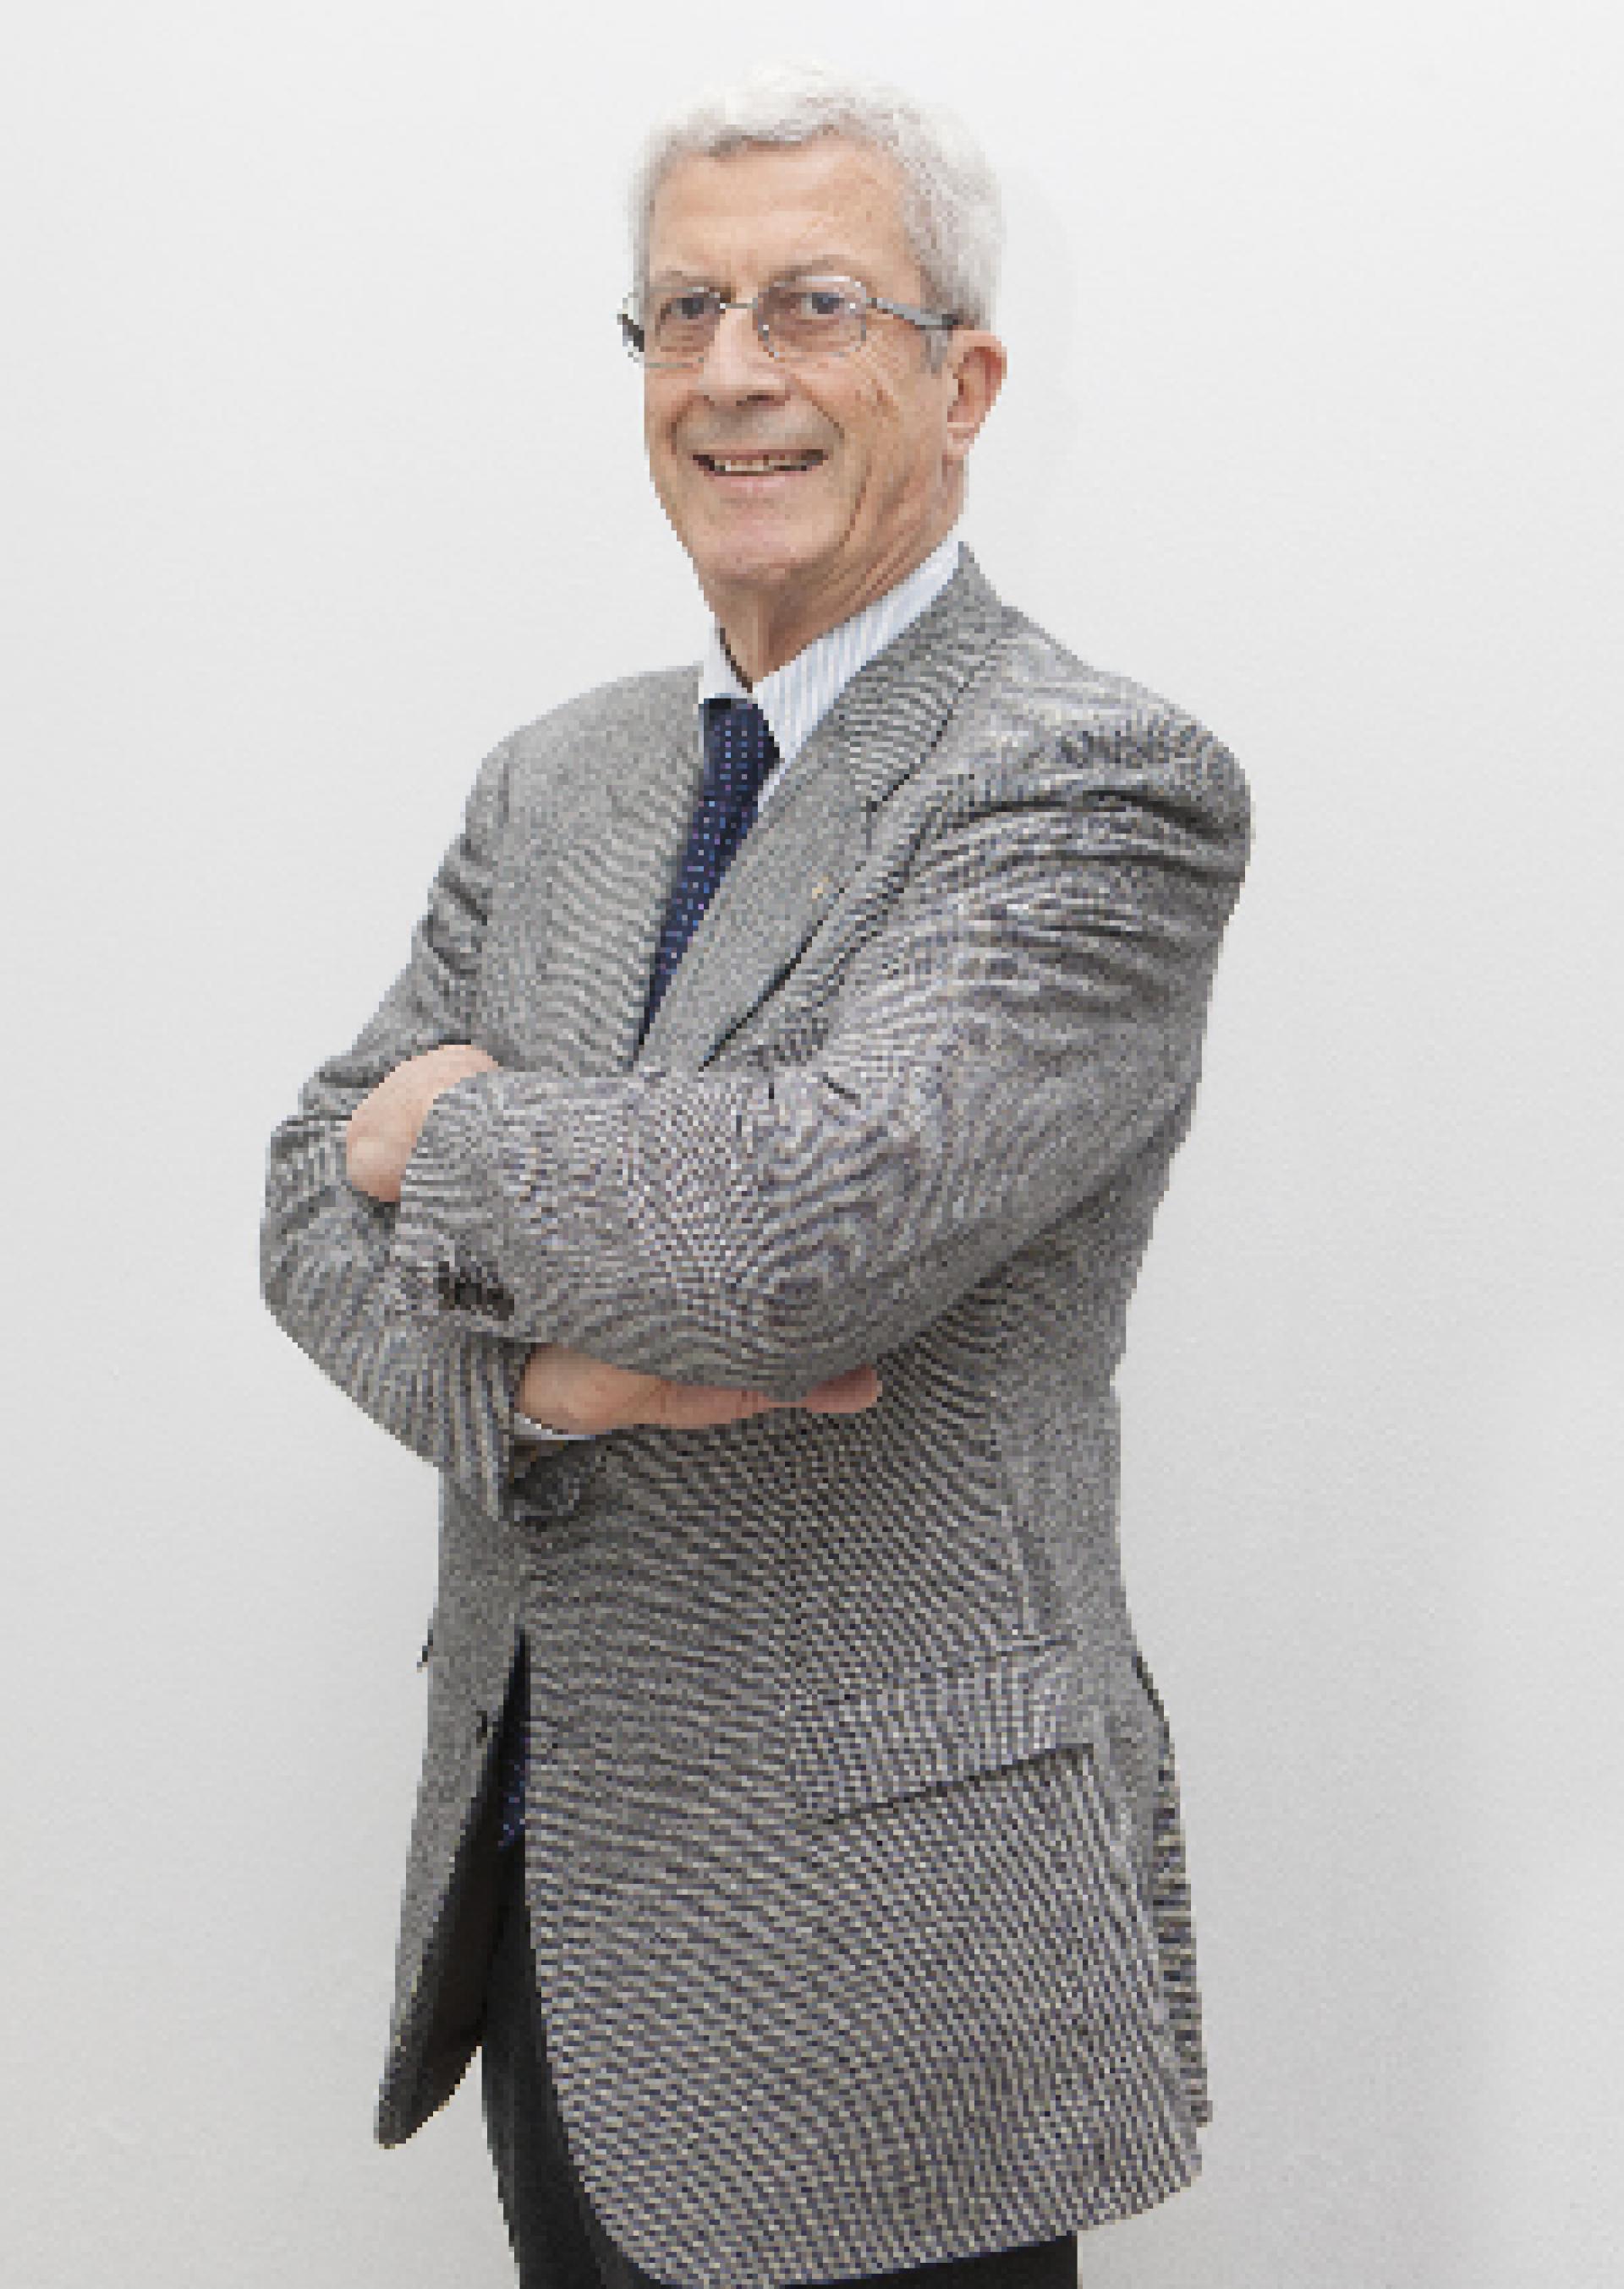 Giovanni Lercker